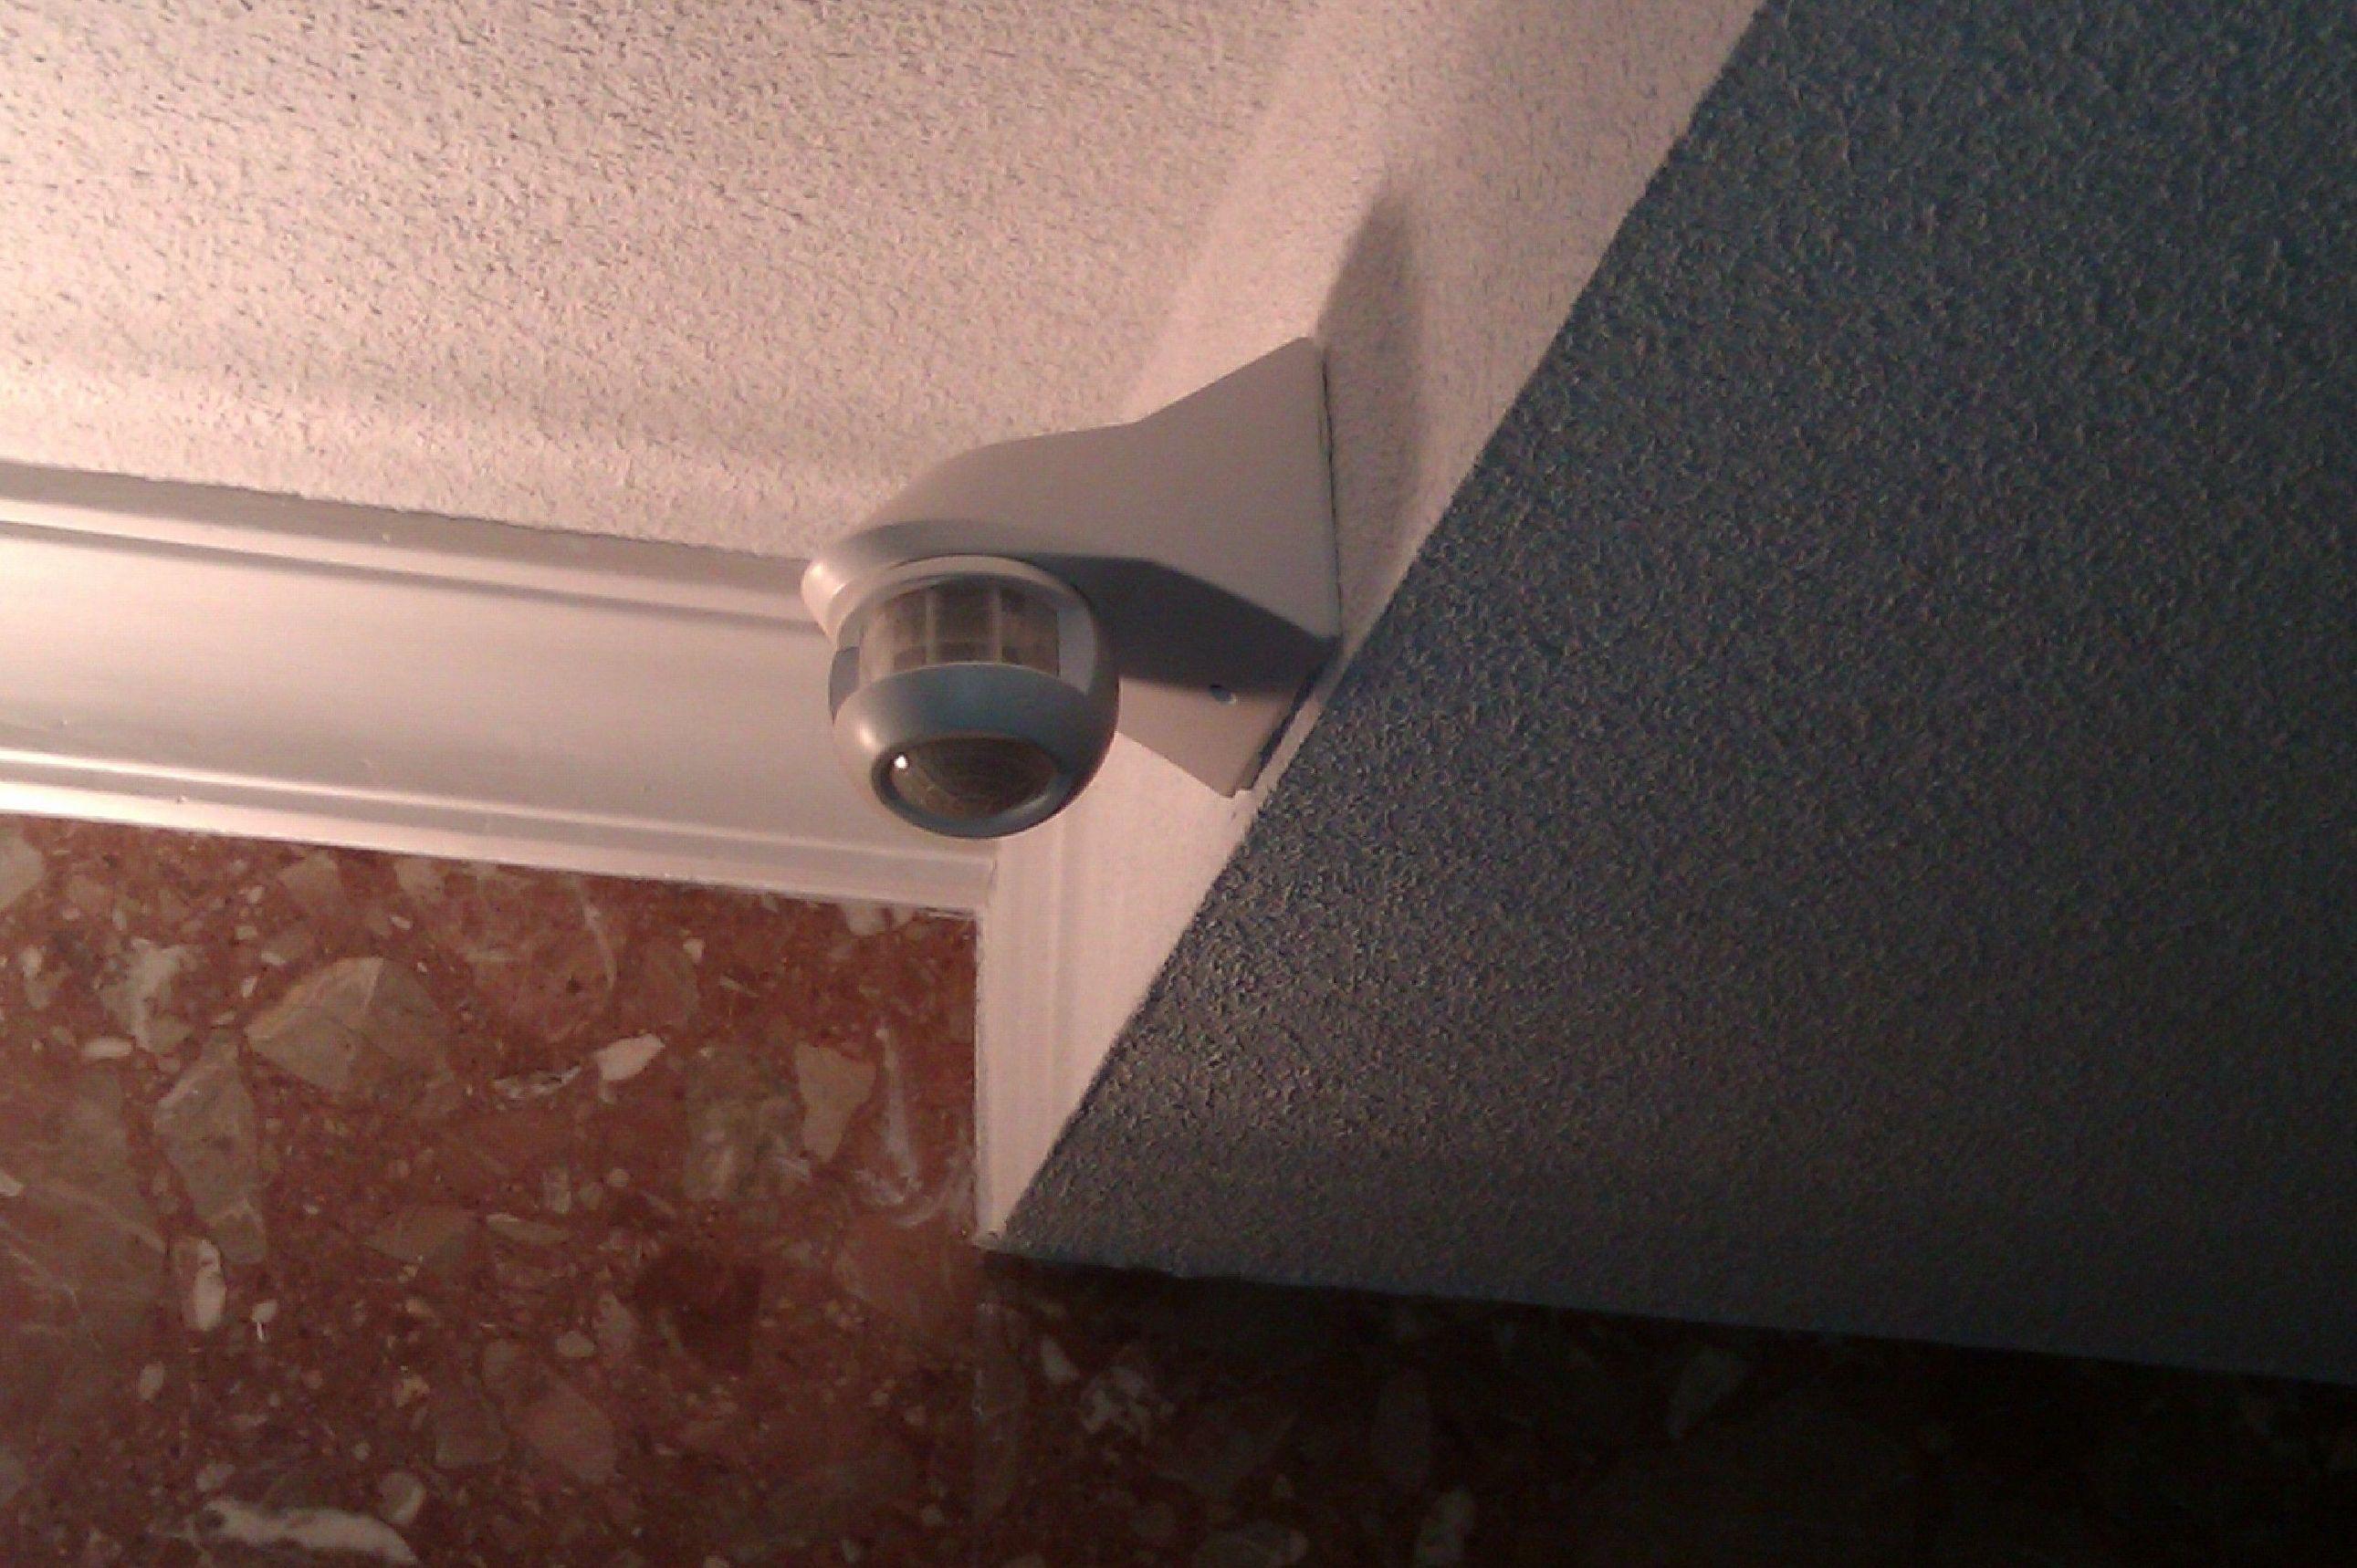 Foto 27 de Electricidad en Madrid | Jsp Electrotecnia, S.L.